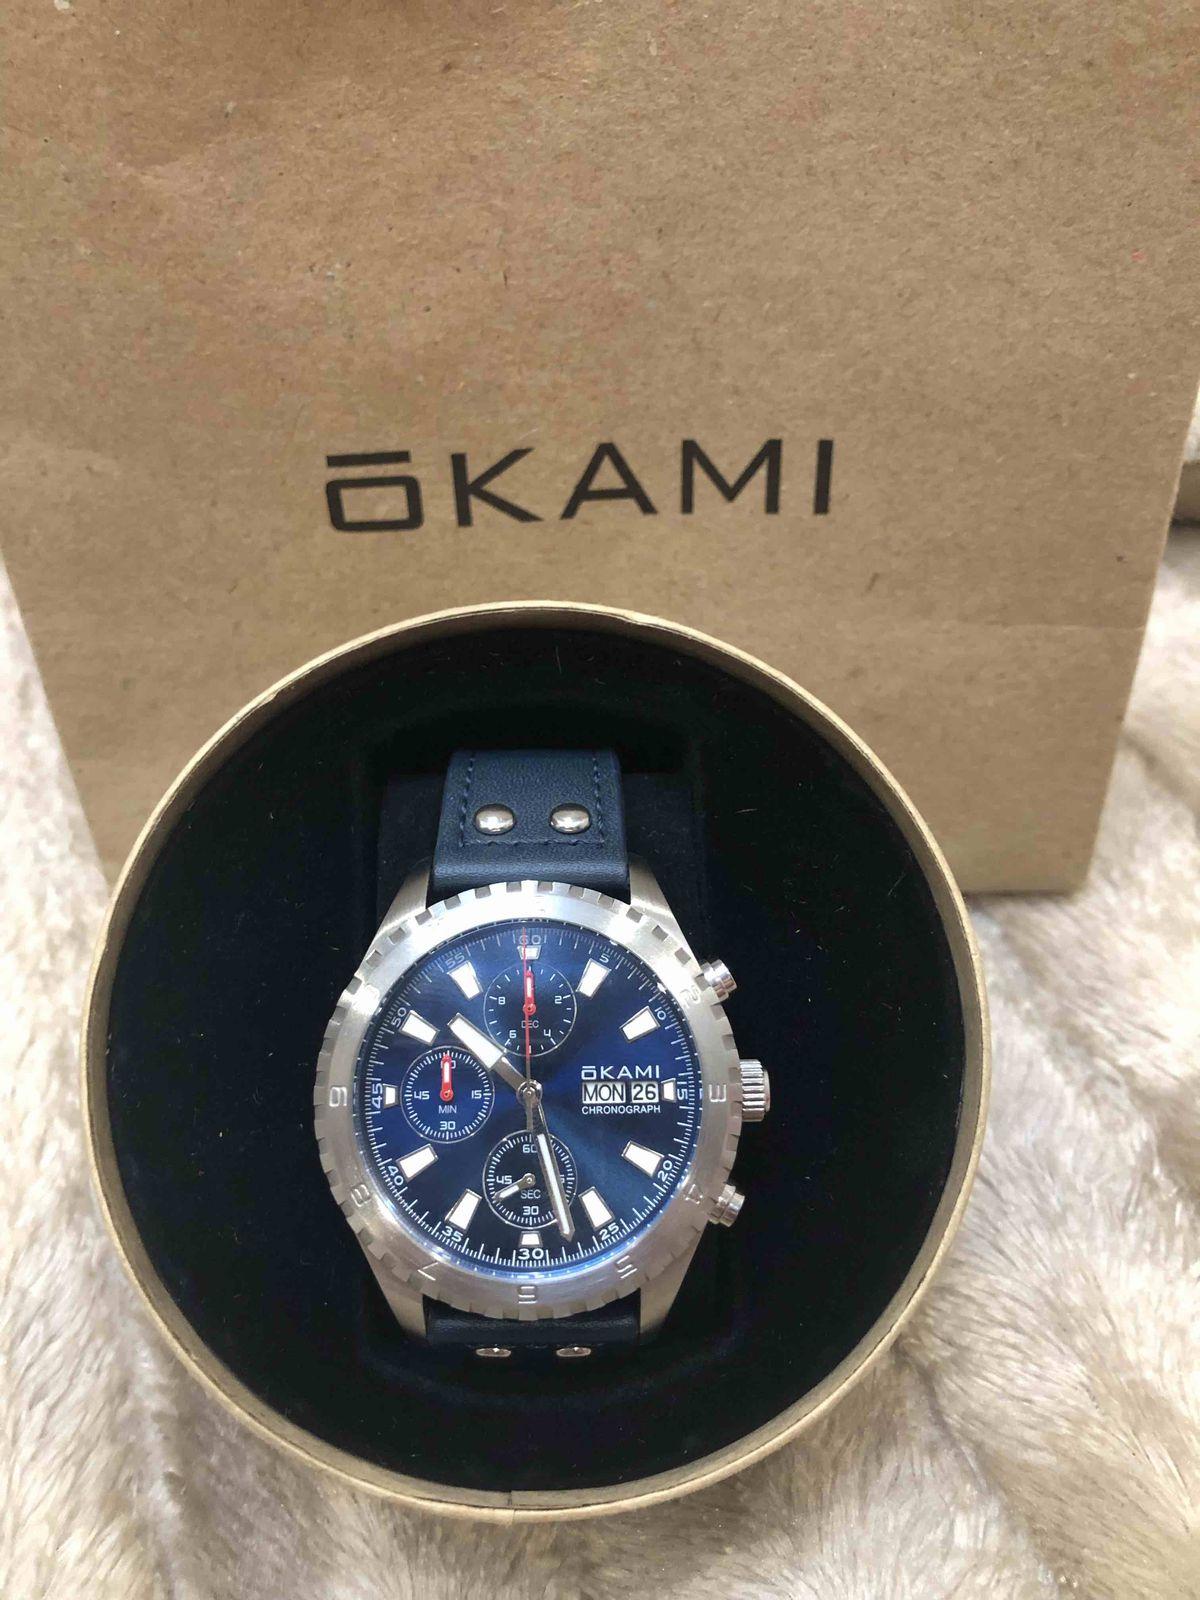 Часы Оками